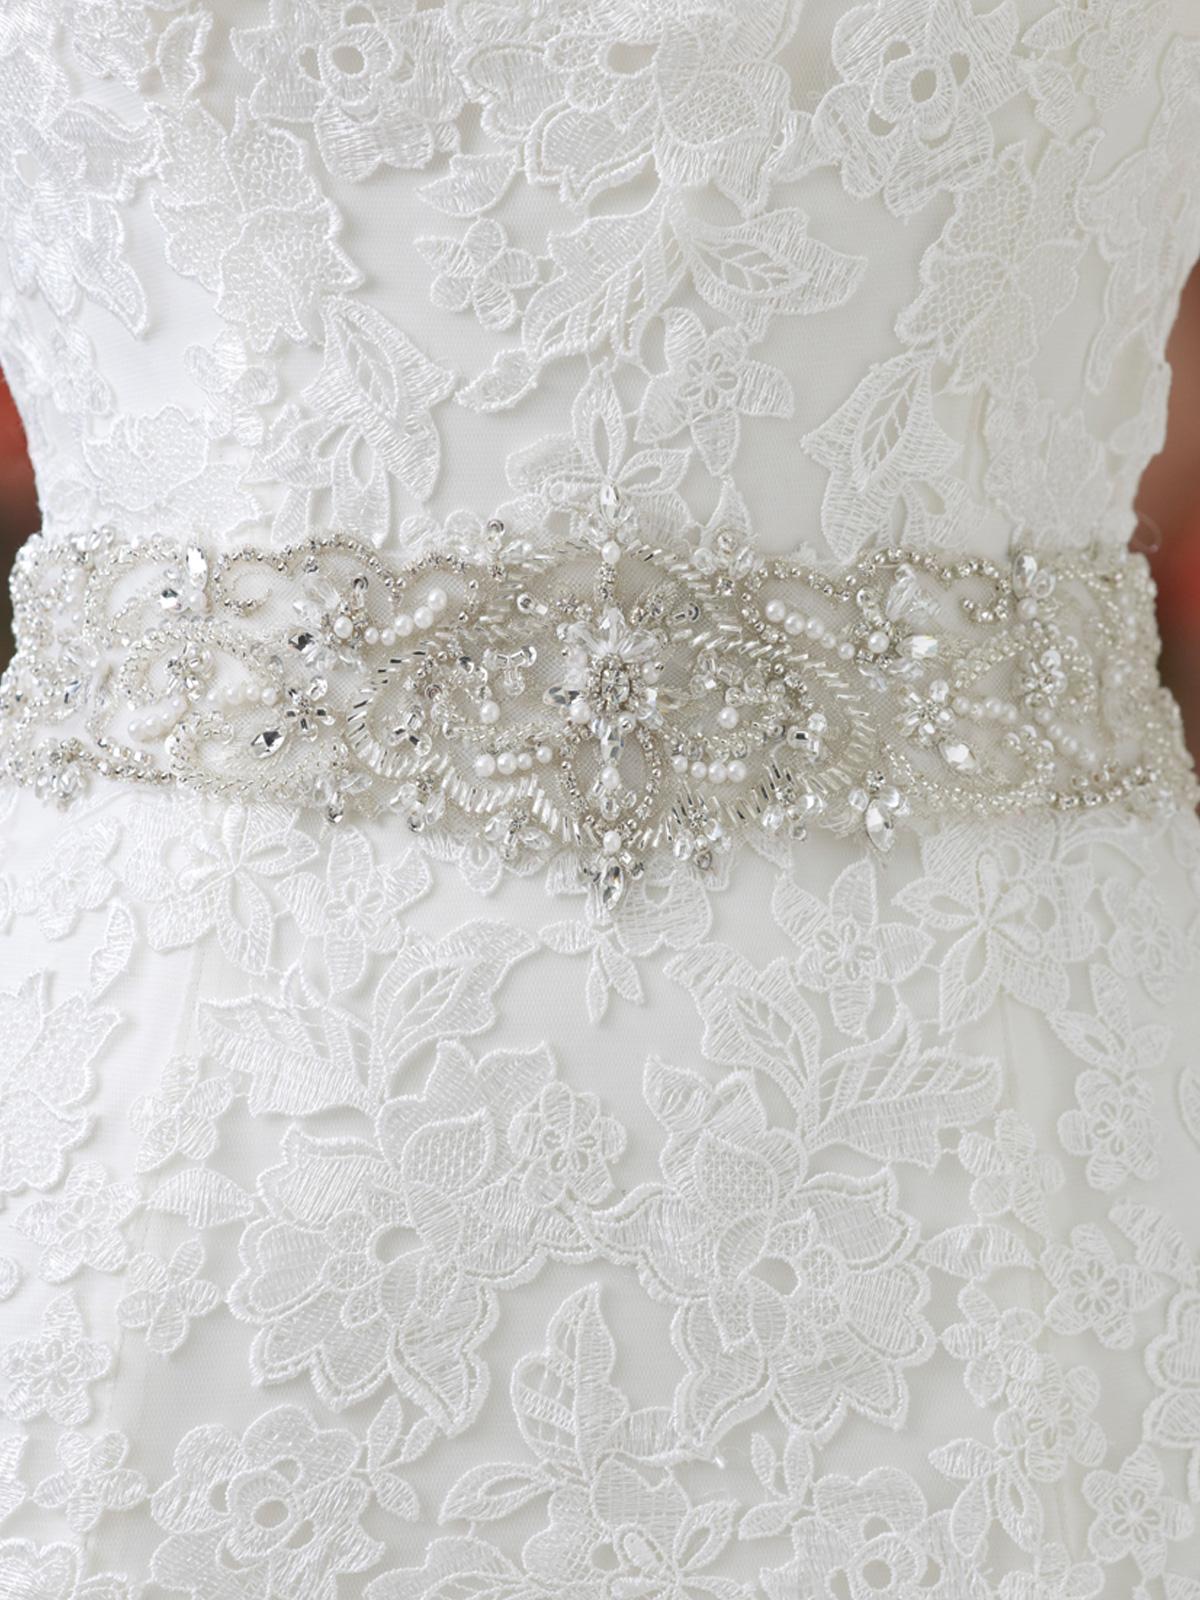 Acessorios Para Noiva - BELTS-11413